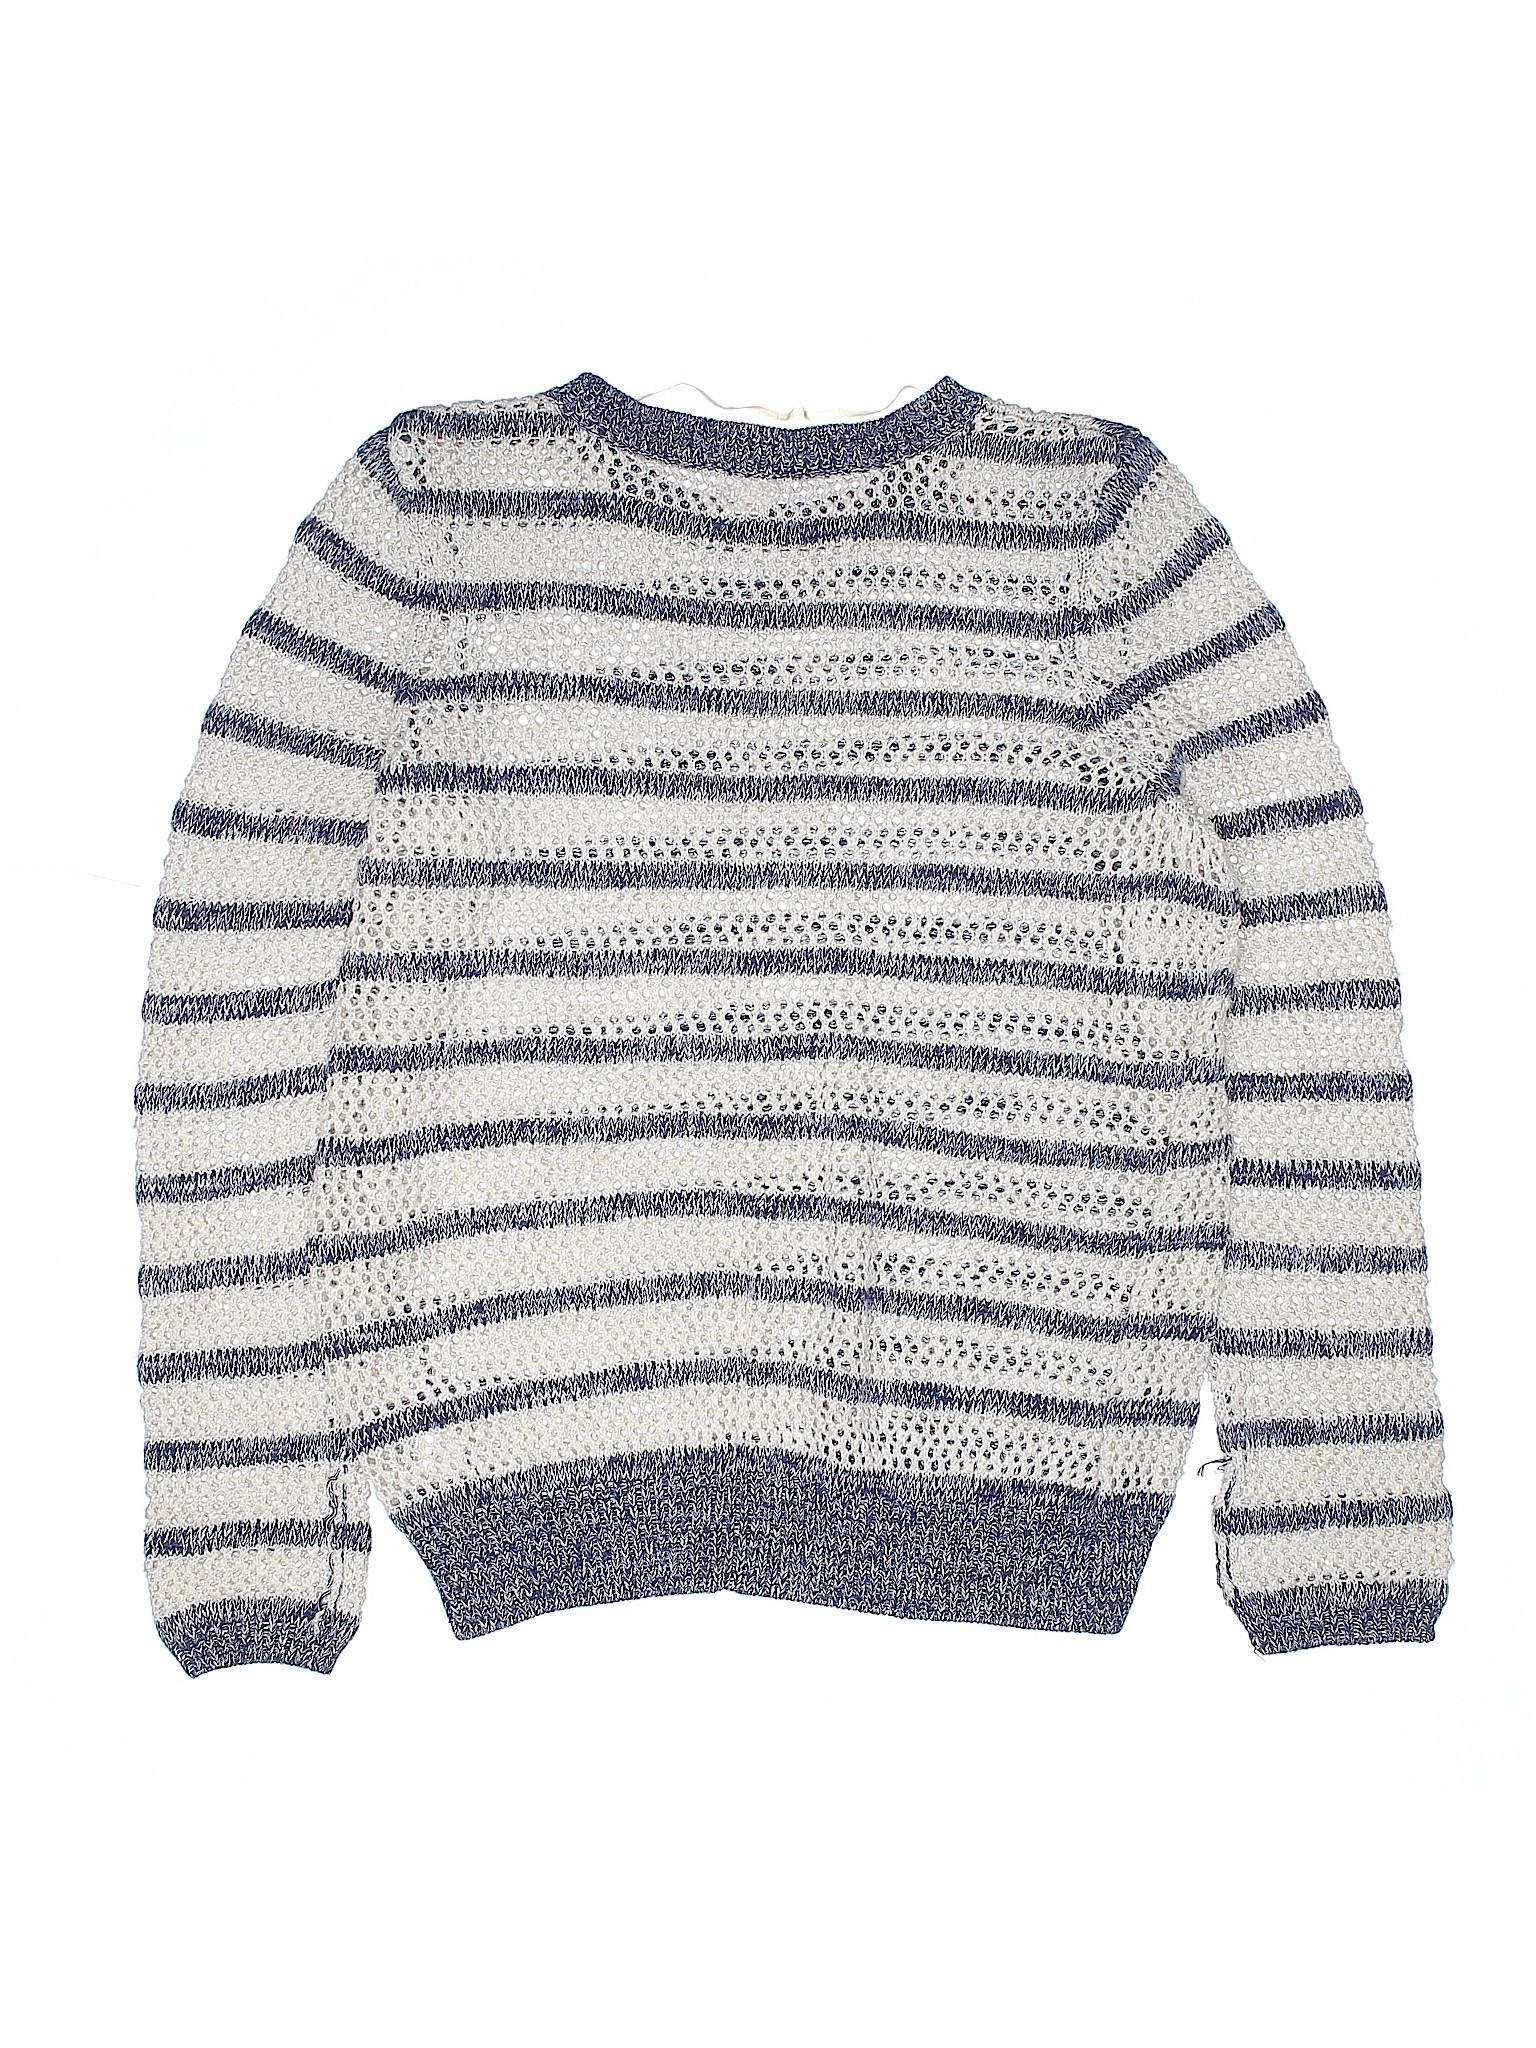 Sweater Boutique Boutique Xhilaration winter winter Pullover gHxZaqwU